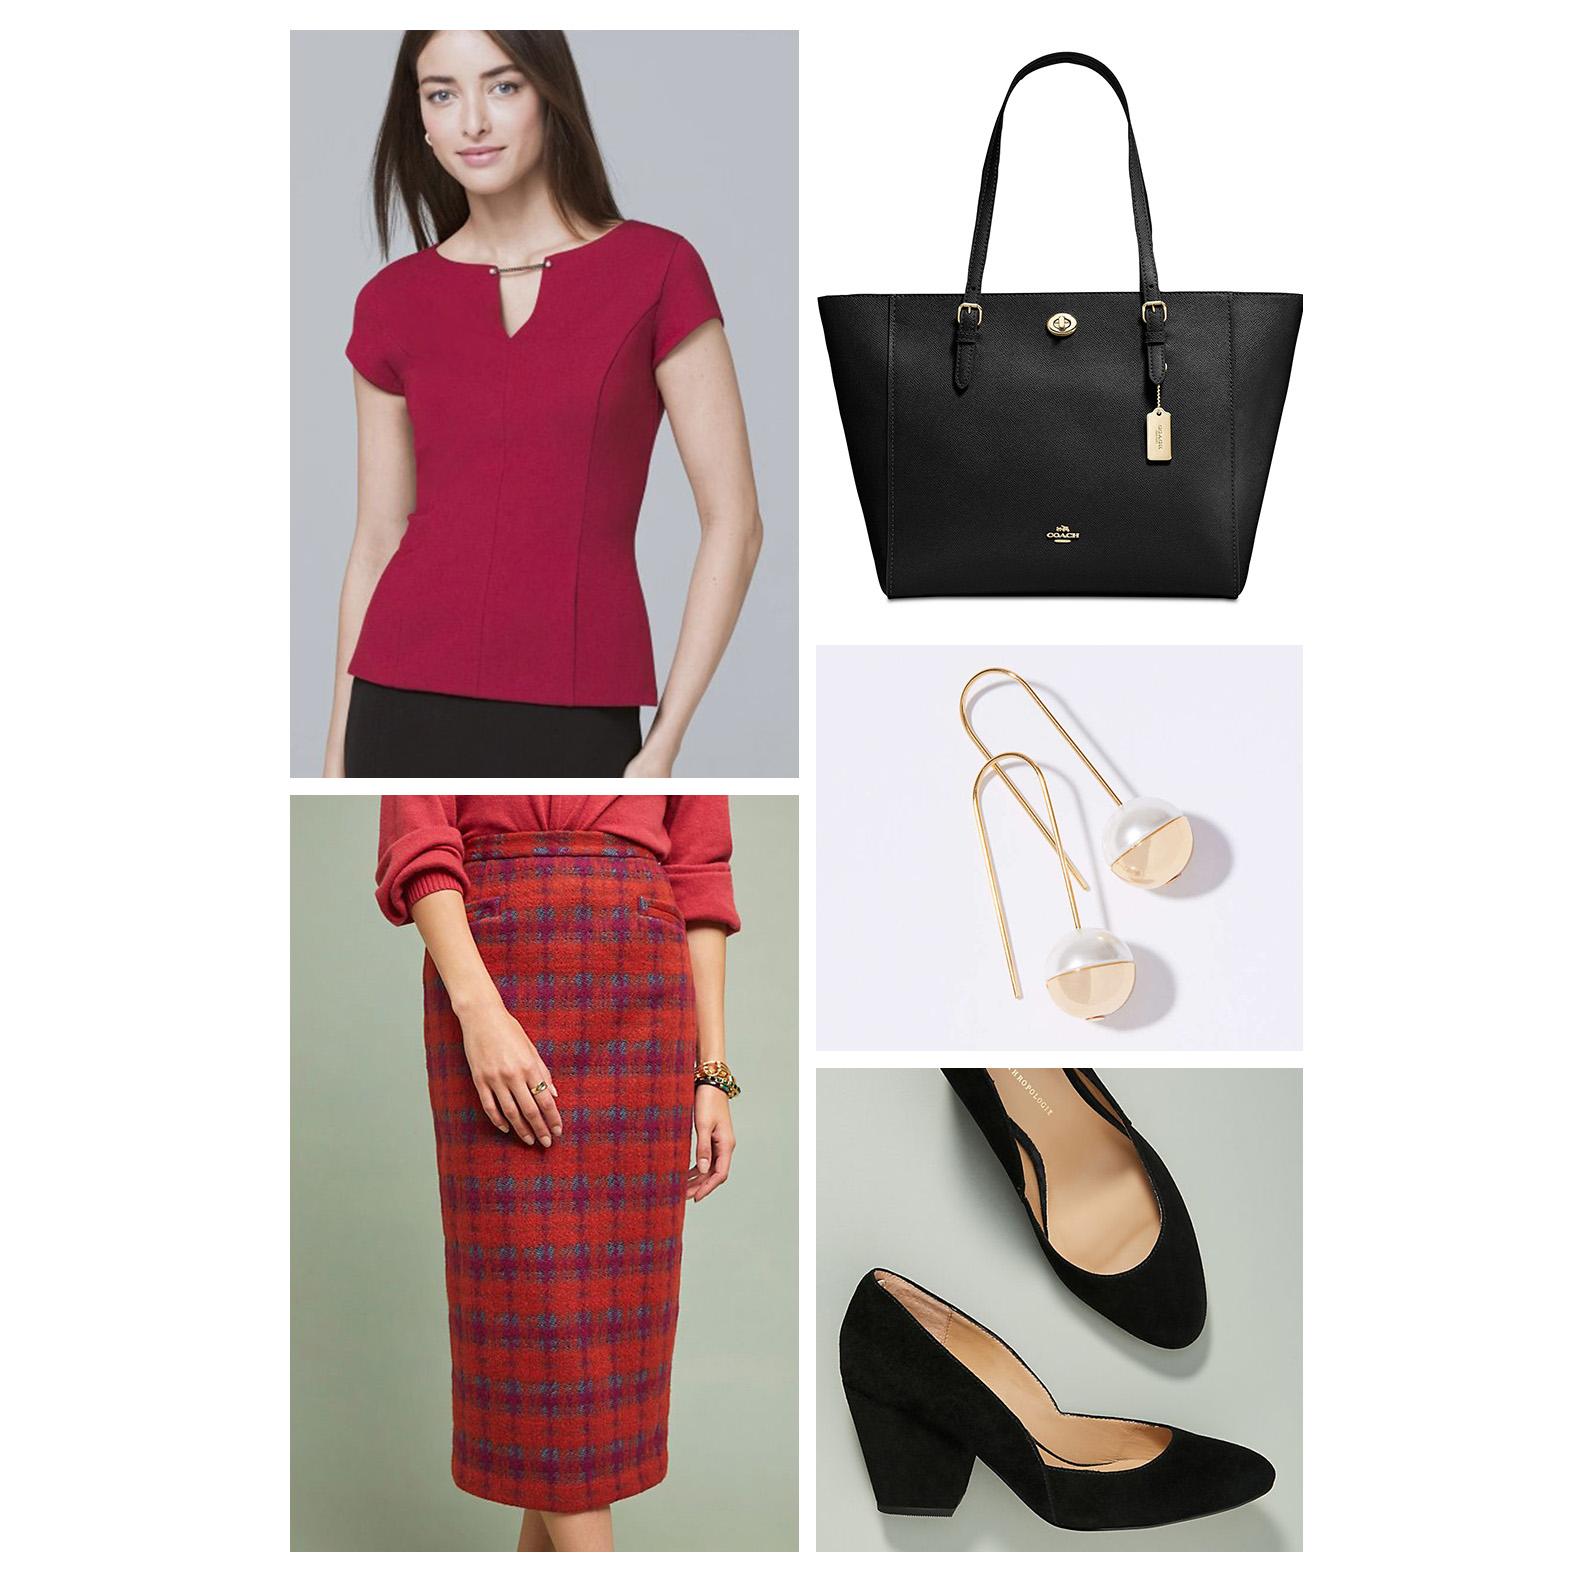 fall-autumn-outfit-work-2018-fashion-ideas-red-plaid-midi-pencil-skirt-top-black-pumps-tote-bag-pearl-gold-earrings-retro-office.jpg